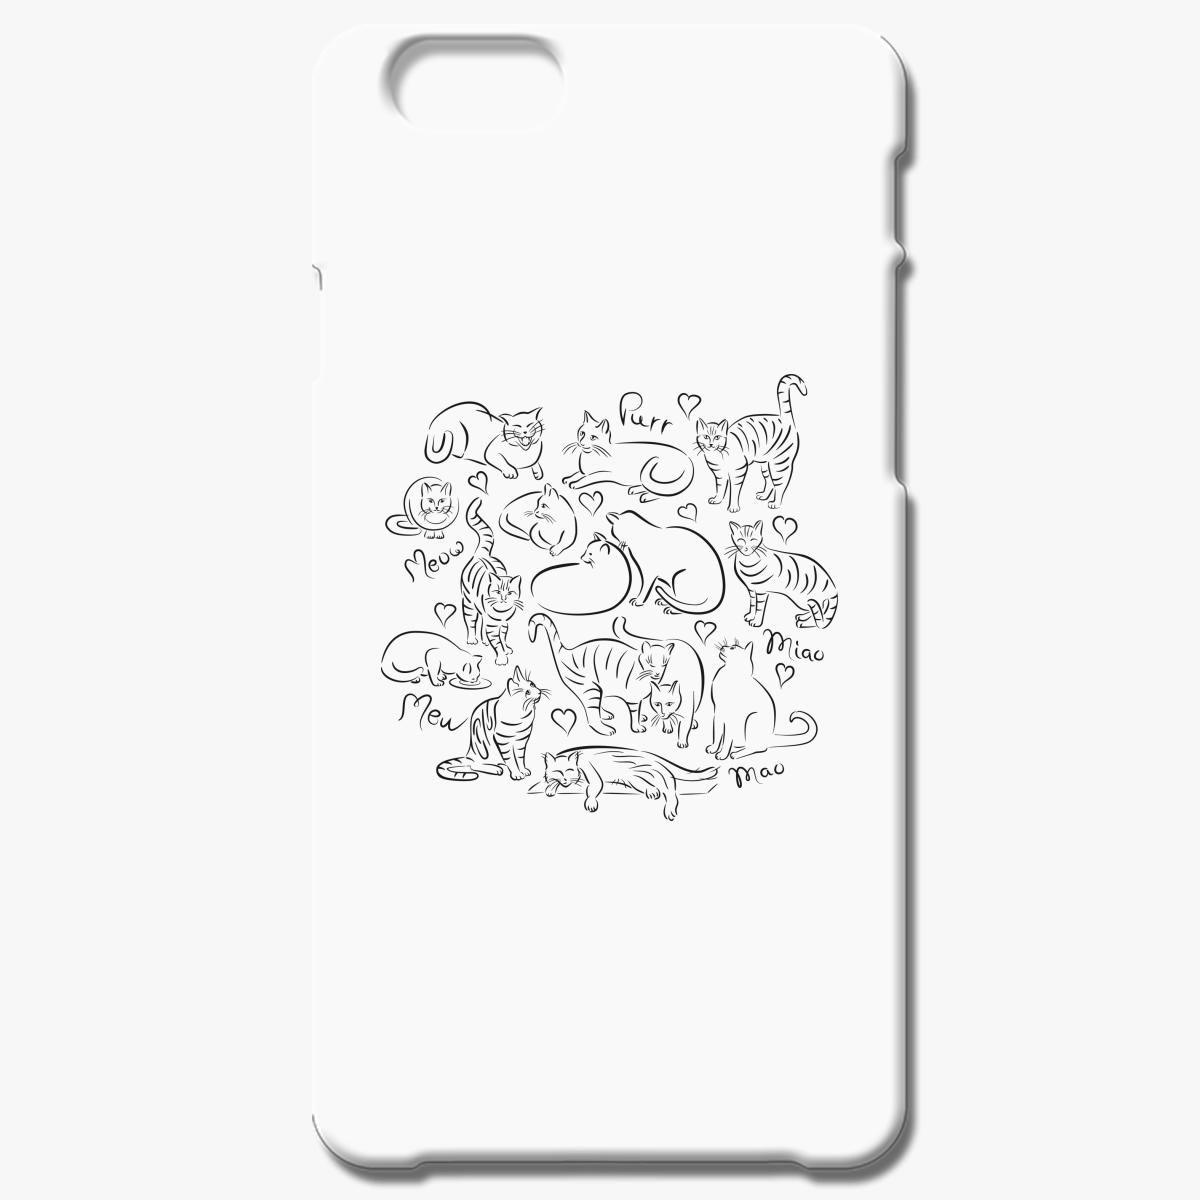 Brushstroke Cats Iphone 6 6s Plus Case